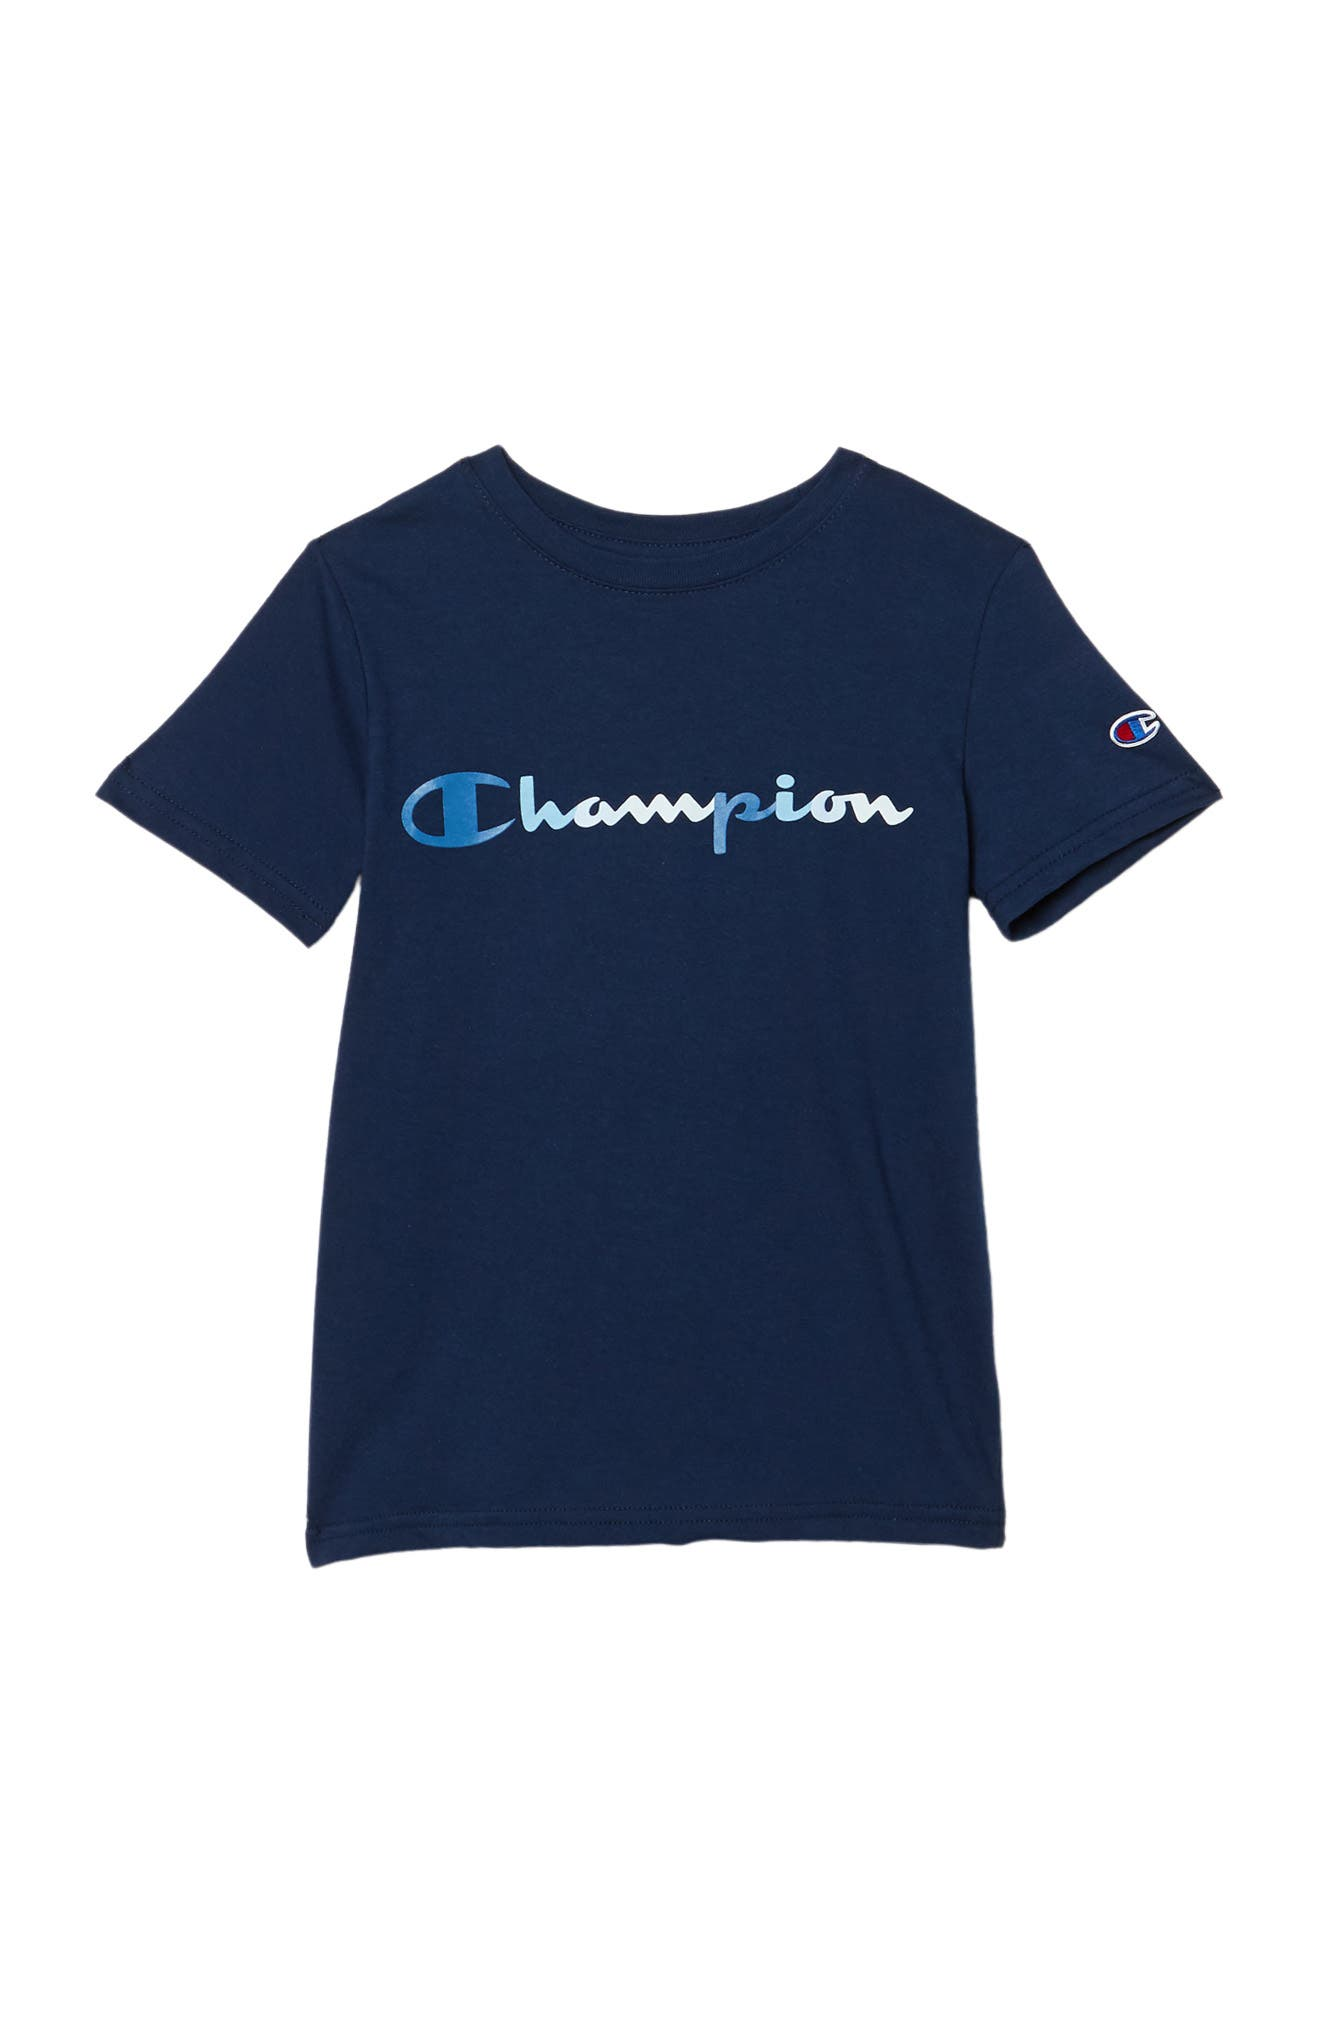 Image of Champion Tonal Script Graphic T-Shirt